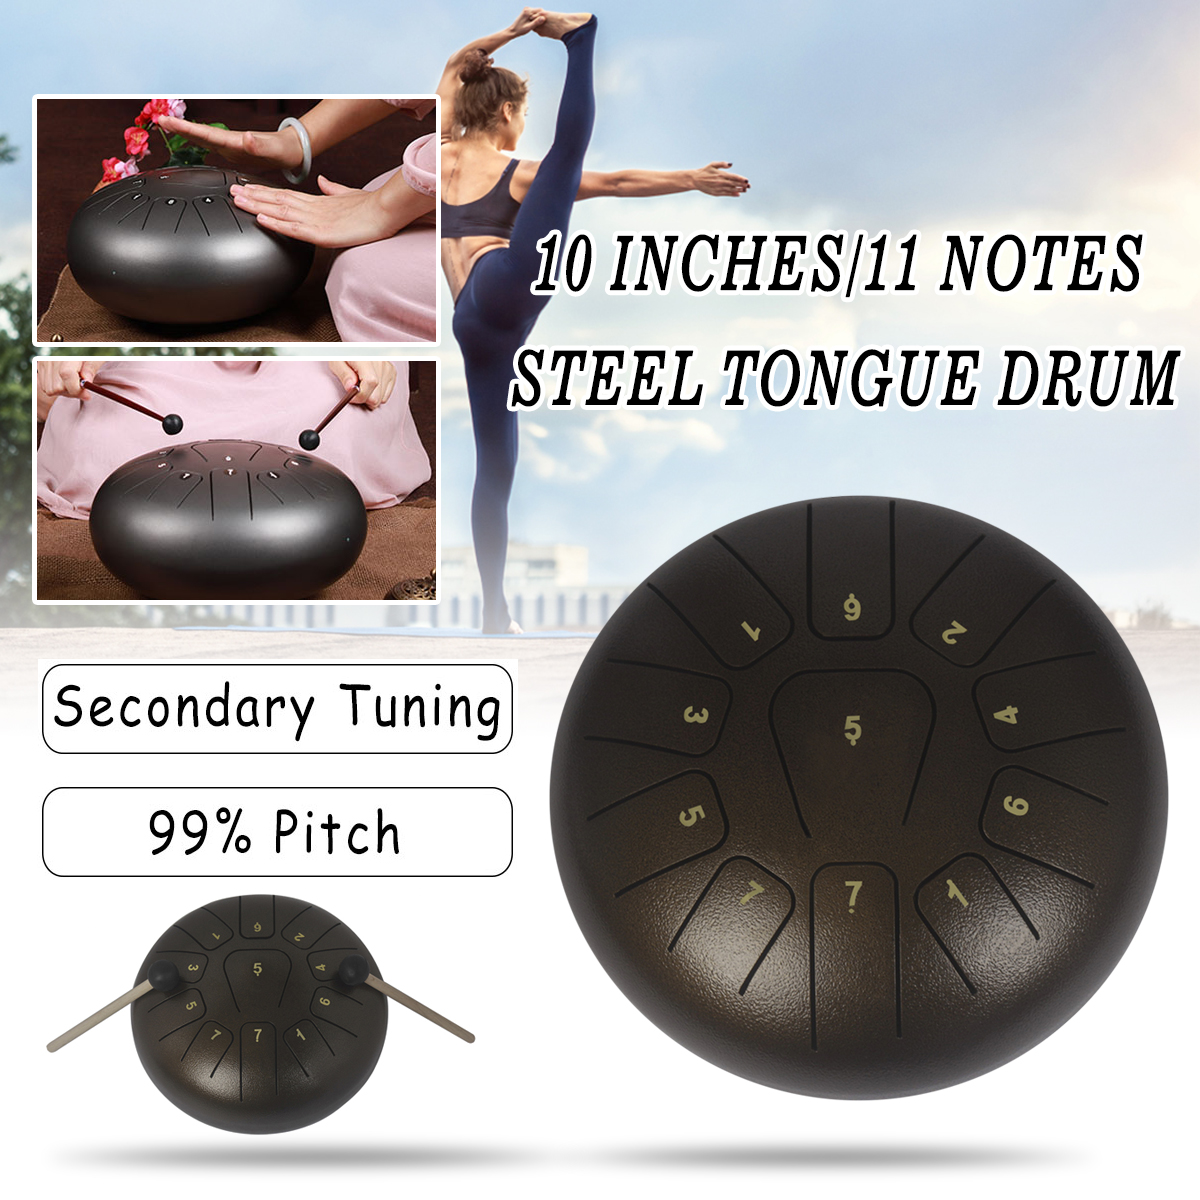 10'' Steel Tongue Drum Handpan Drum D Major 11 Notes Hand Tank Drum With Mallets Storage Bag Instrument Gift 25x25x14cm